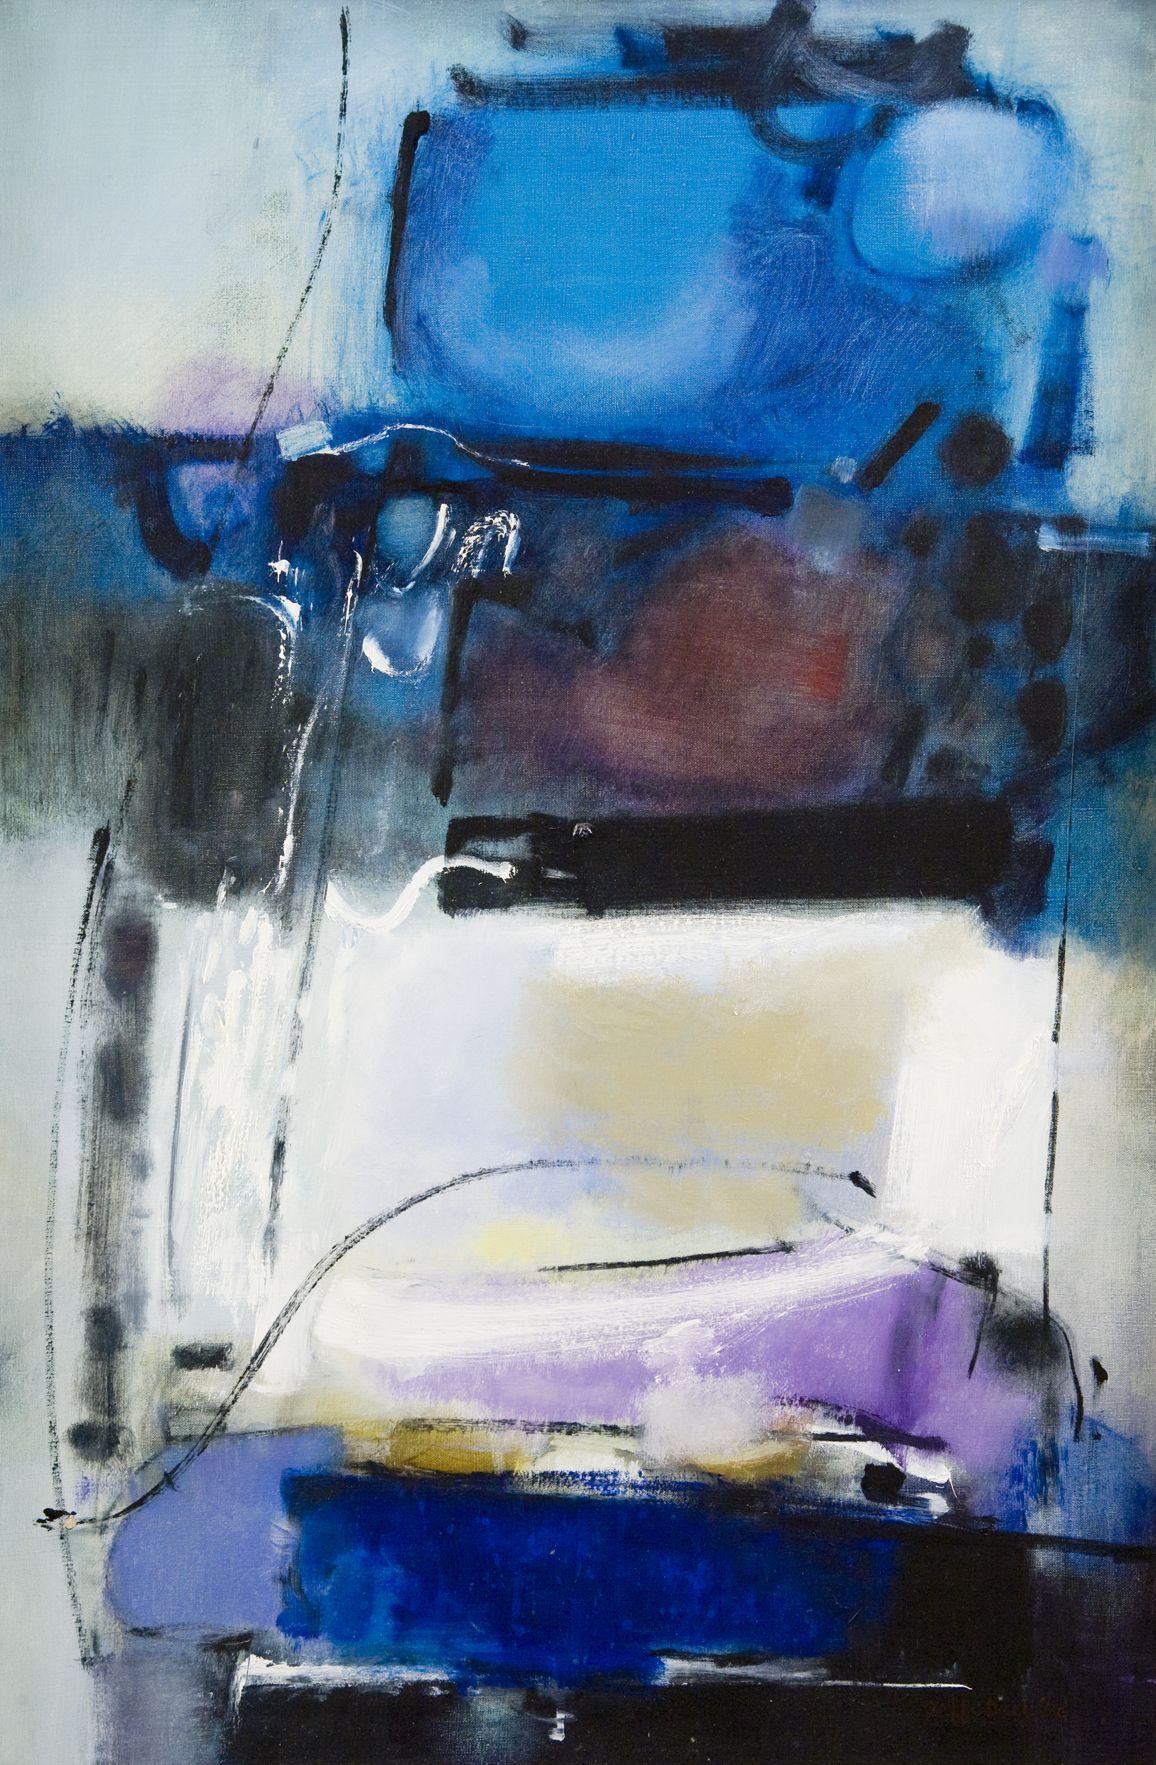 Lee Deffebach, Roman Bath, Abstract Expressionism, utah artist, utah art